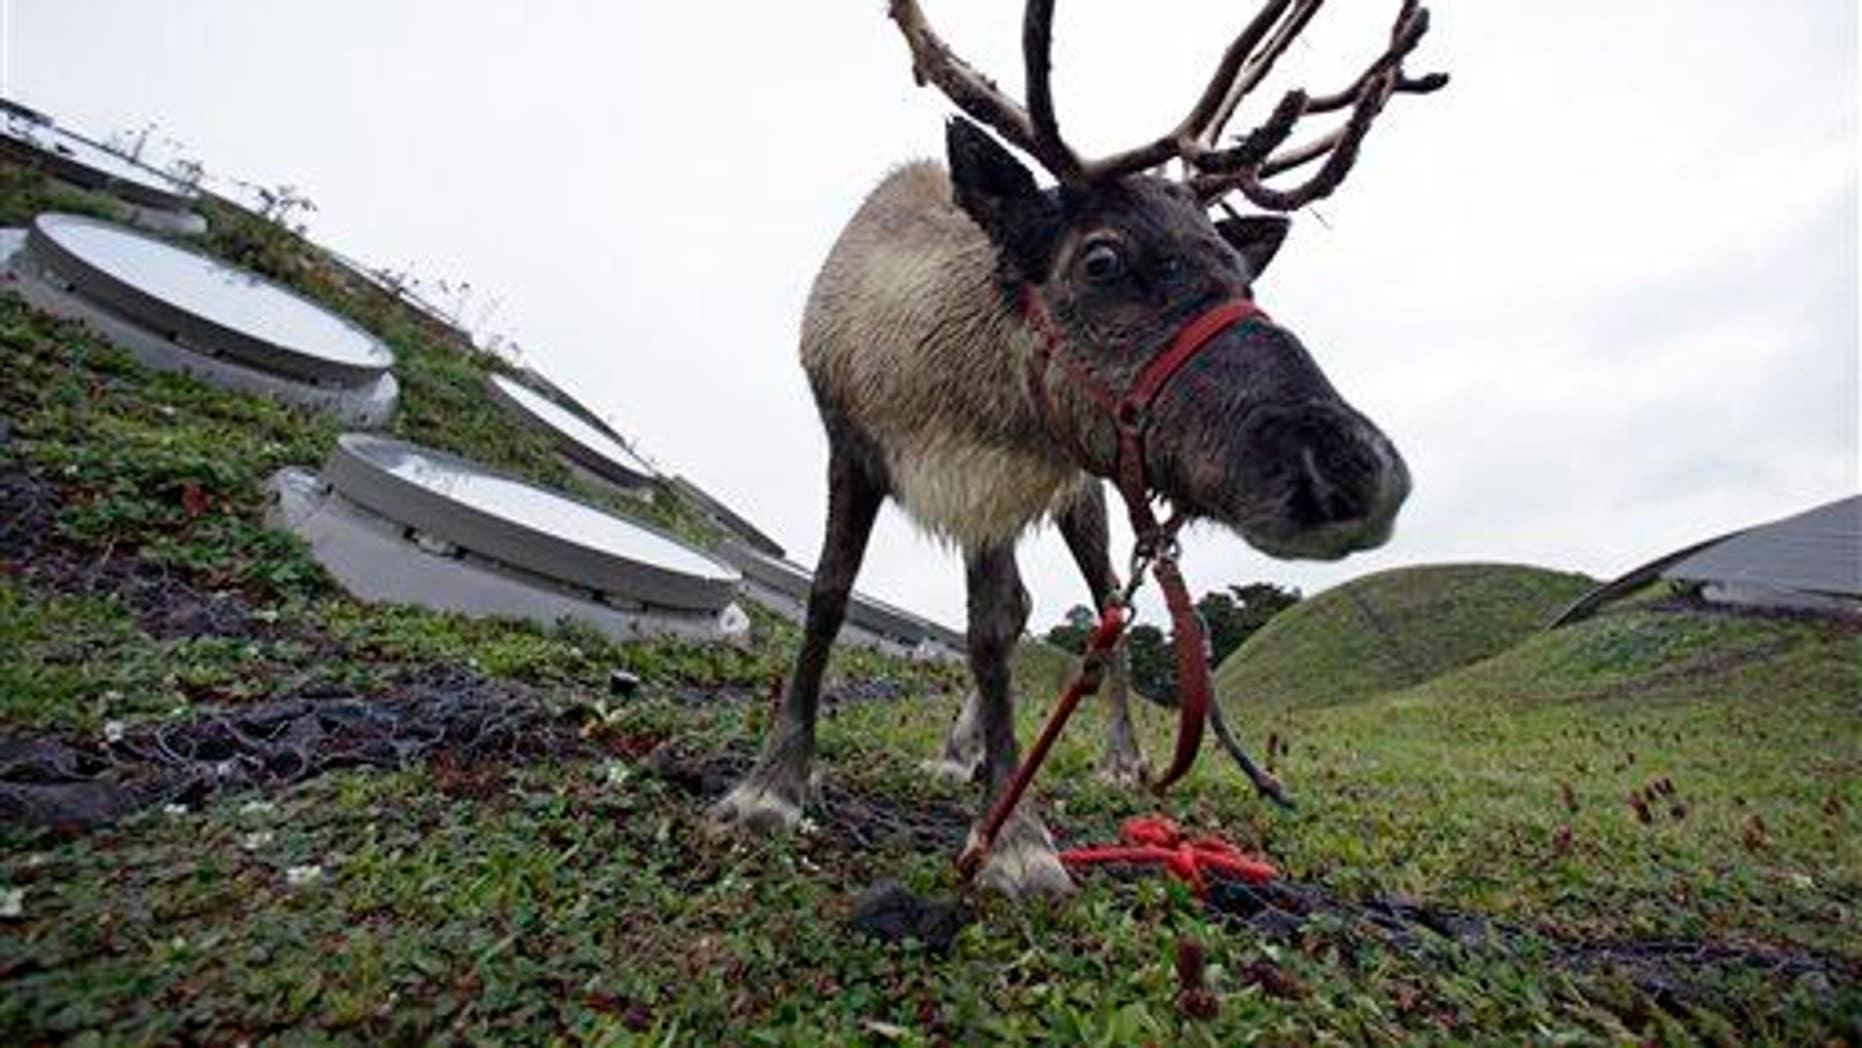 A reindeer grazes in San Francisco.